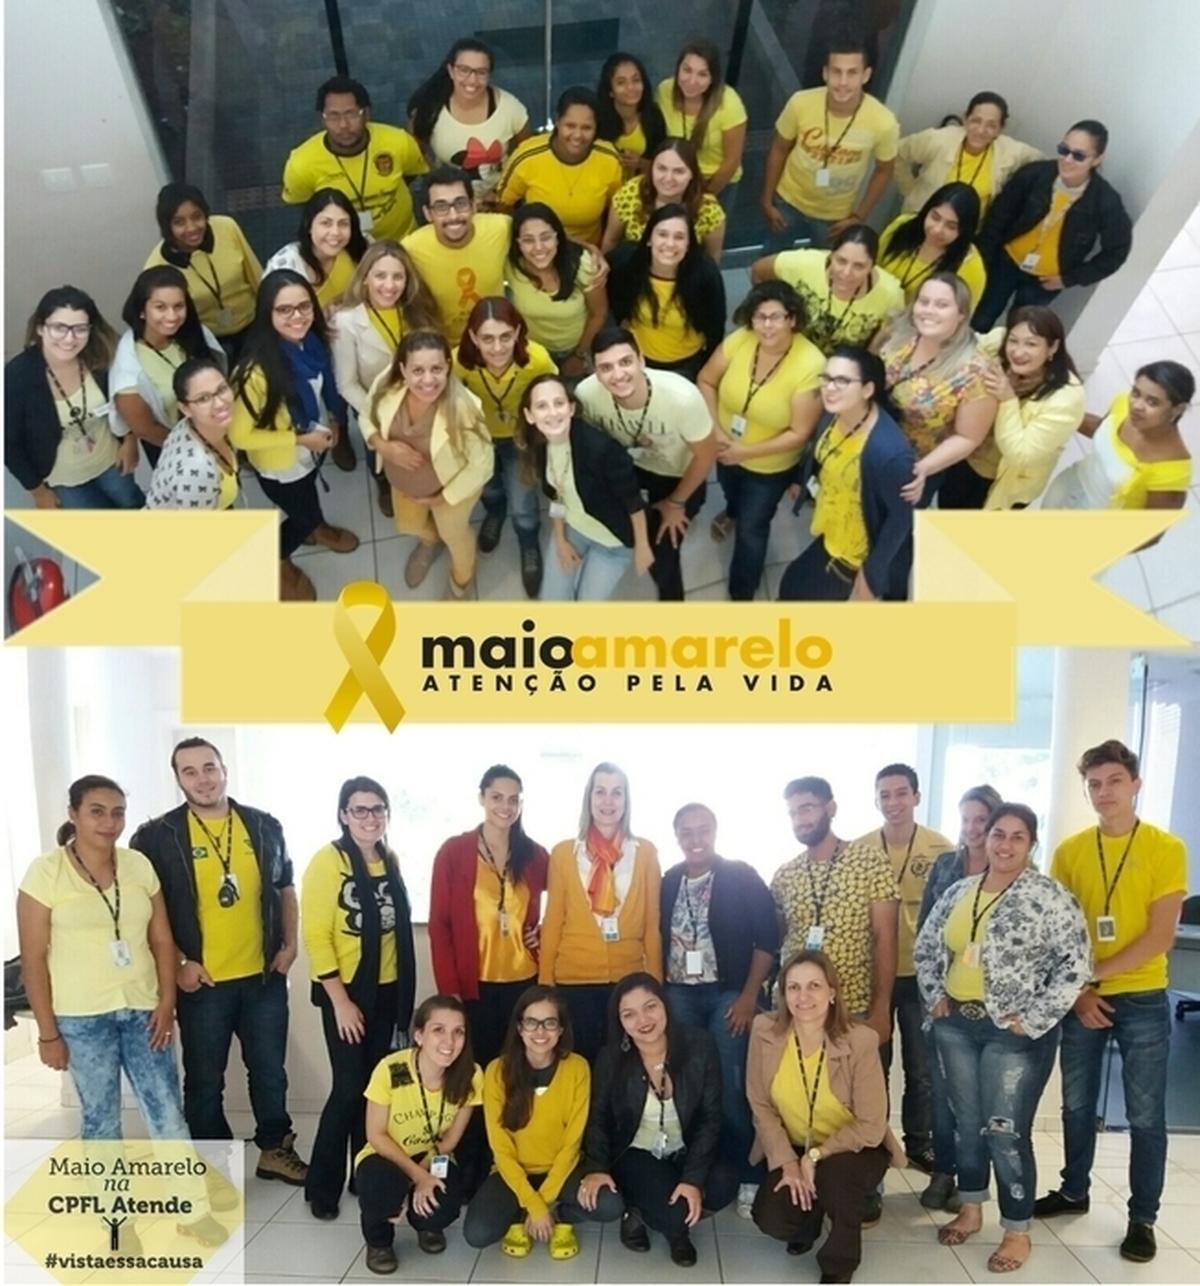 CPFL Atende junto ao movimento Maio Amarelo